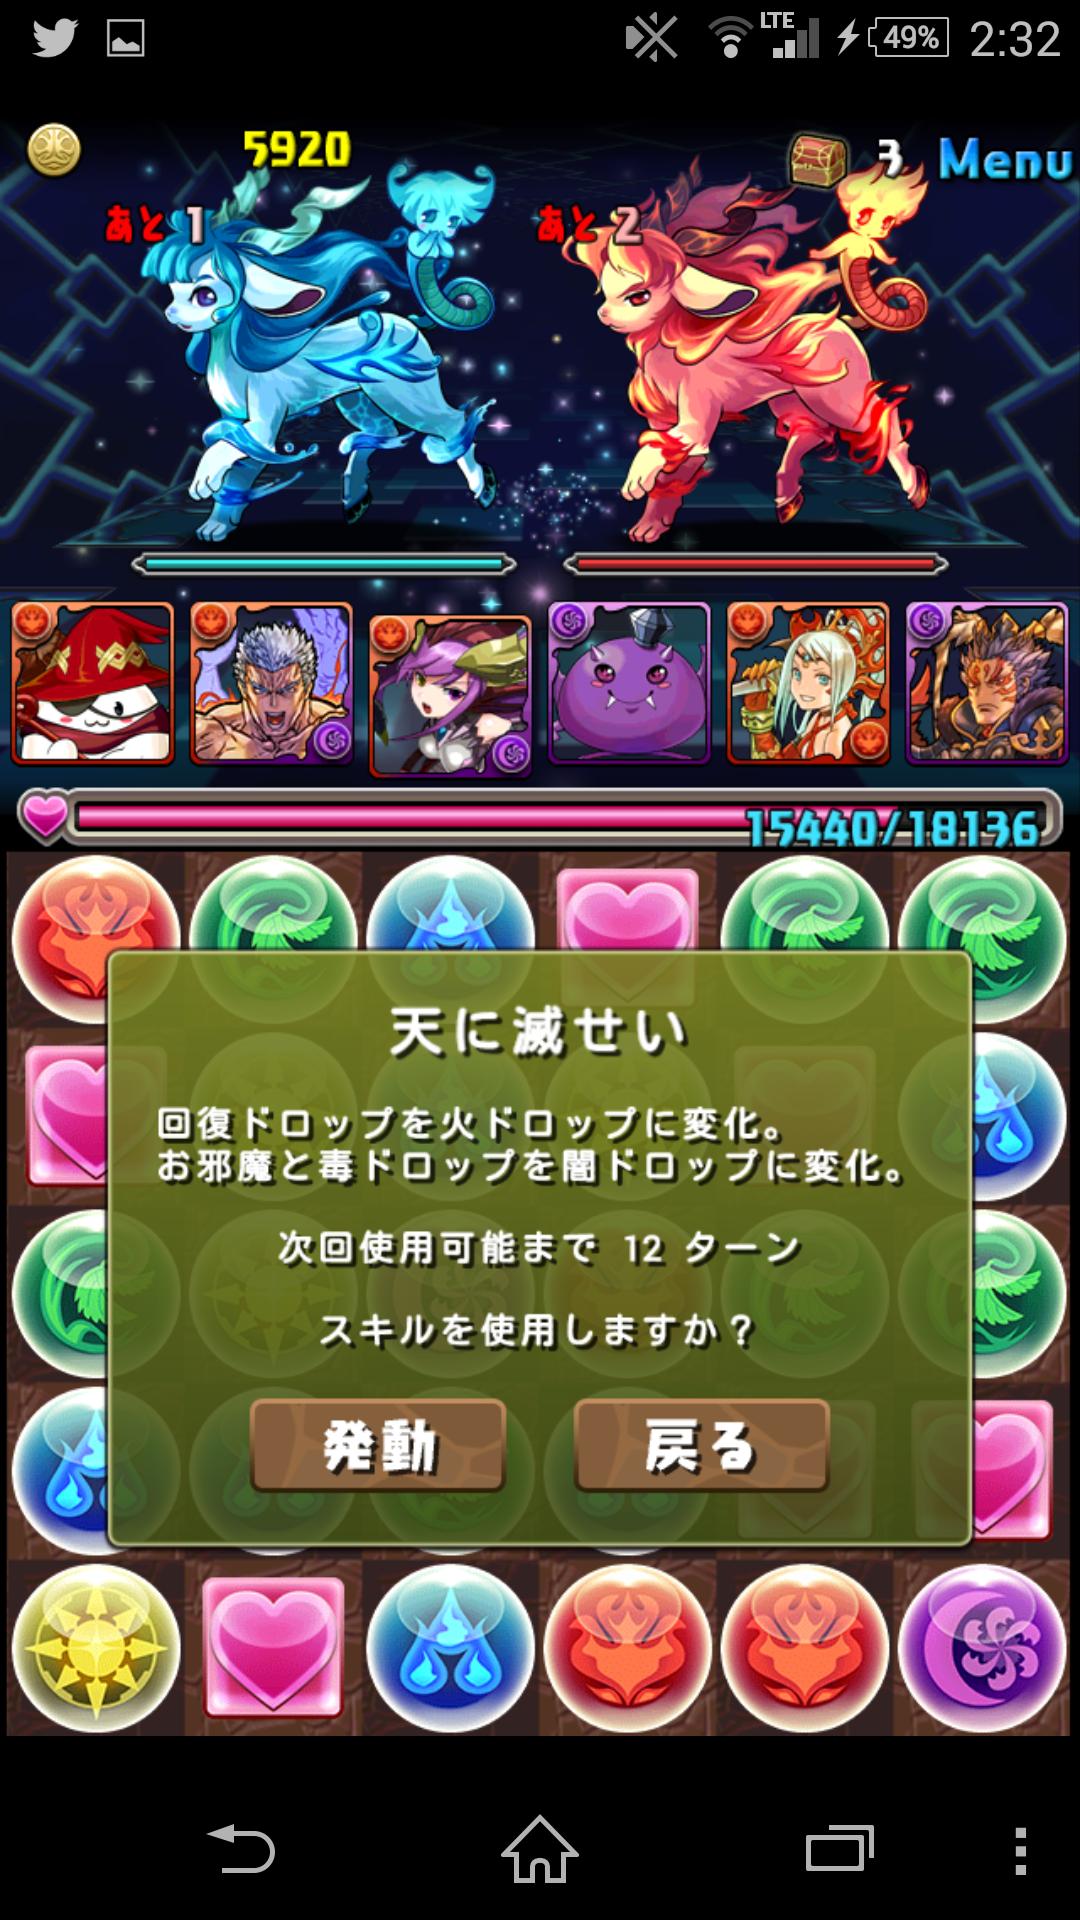 Screenshot_2015-02-18-02-32-32.png